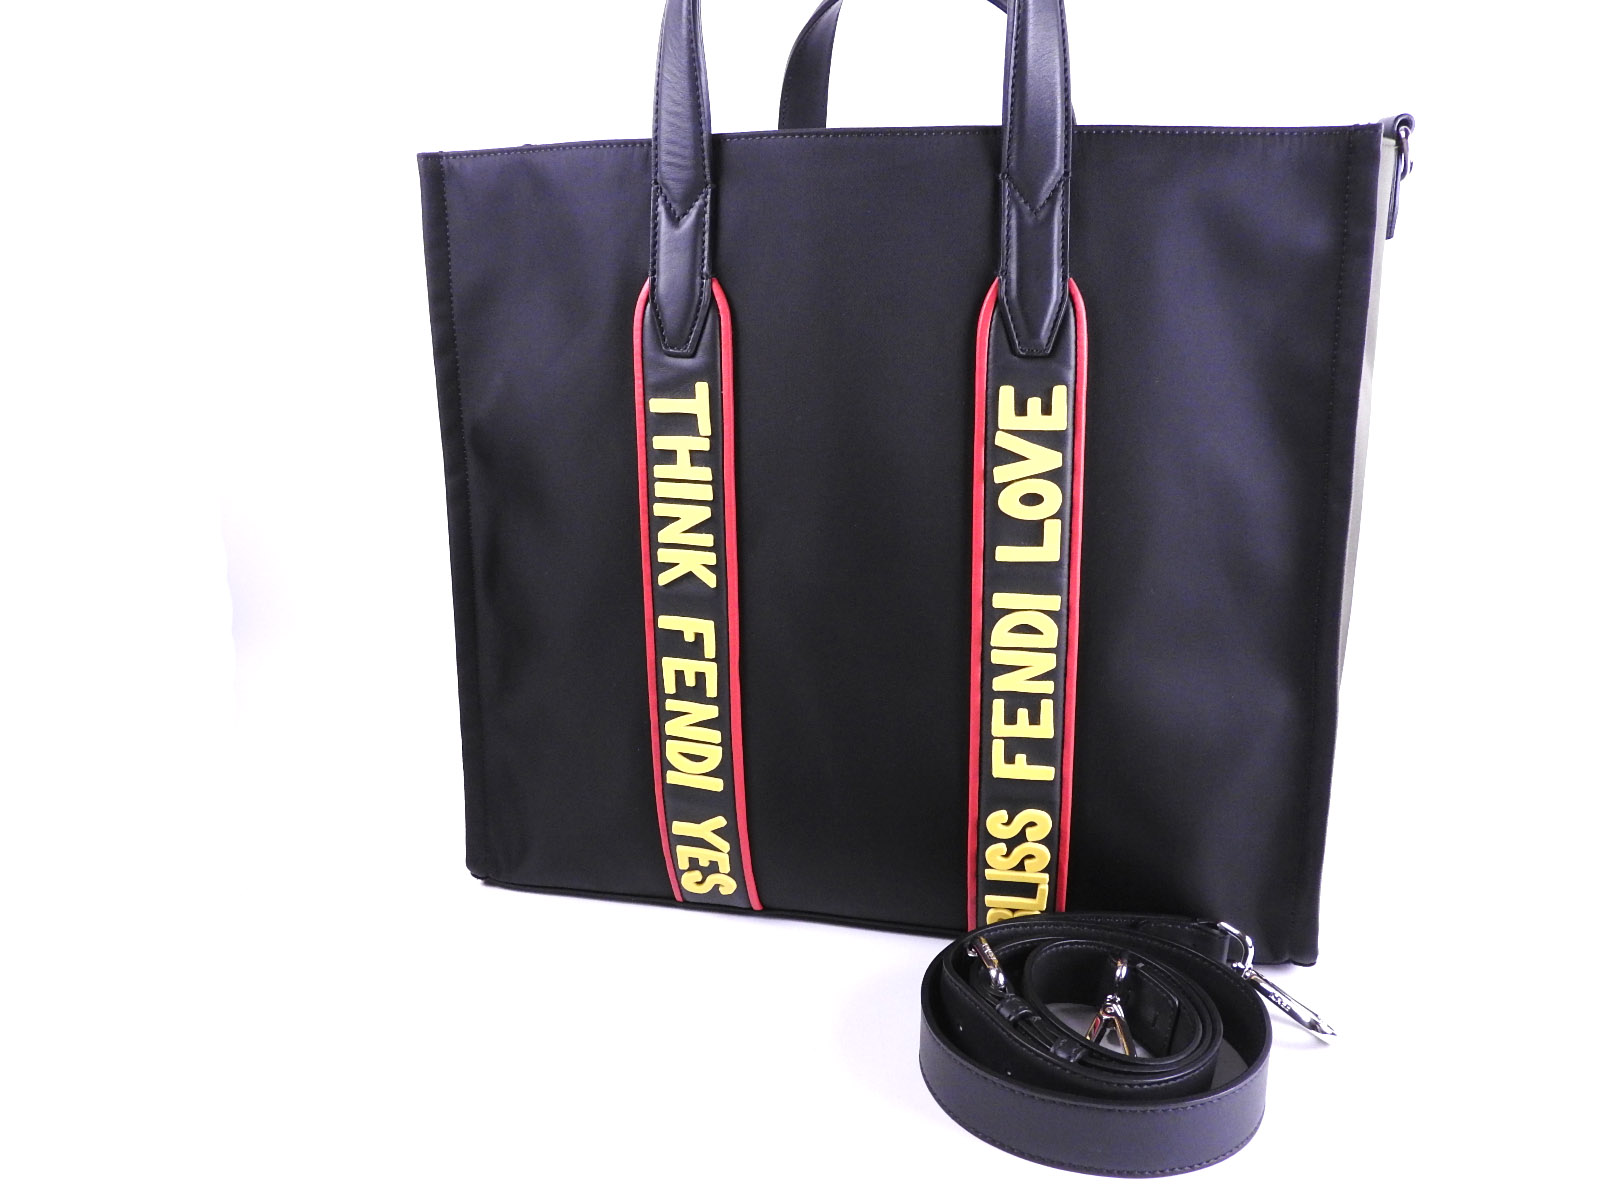 017b509922 Auth FENDI Vocabulary 2way Tote Bag Shoulder Bag Nylon Leather Black 7VA390  8583